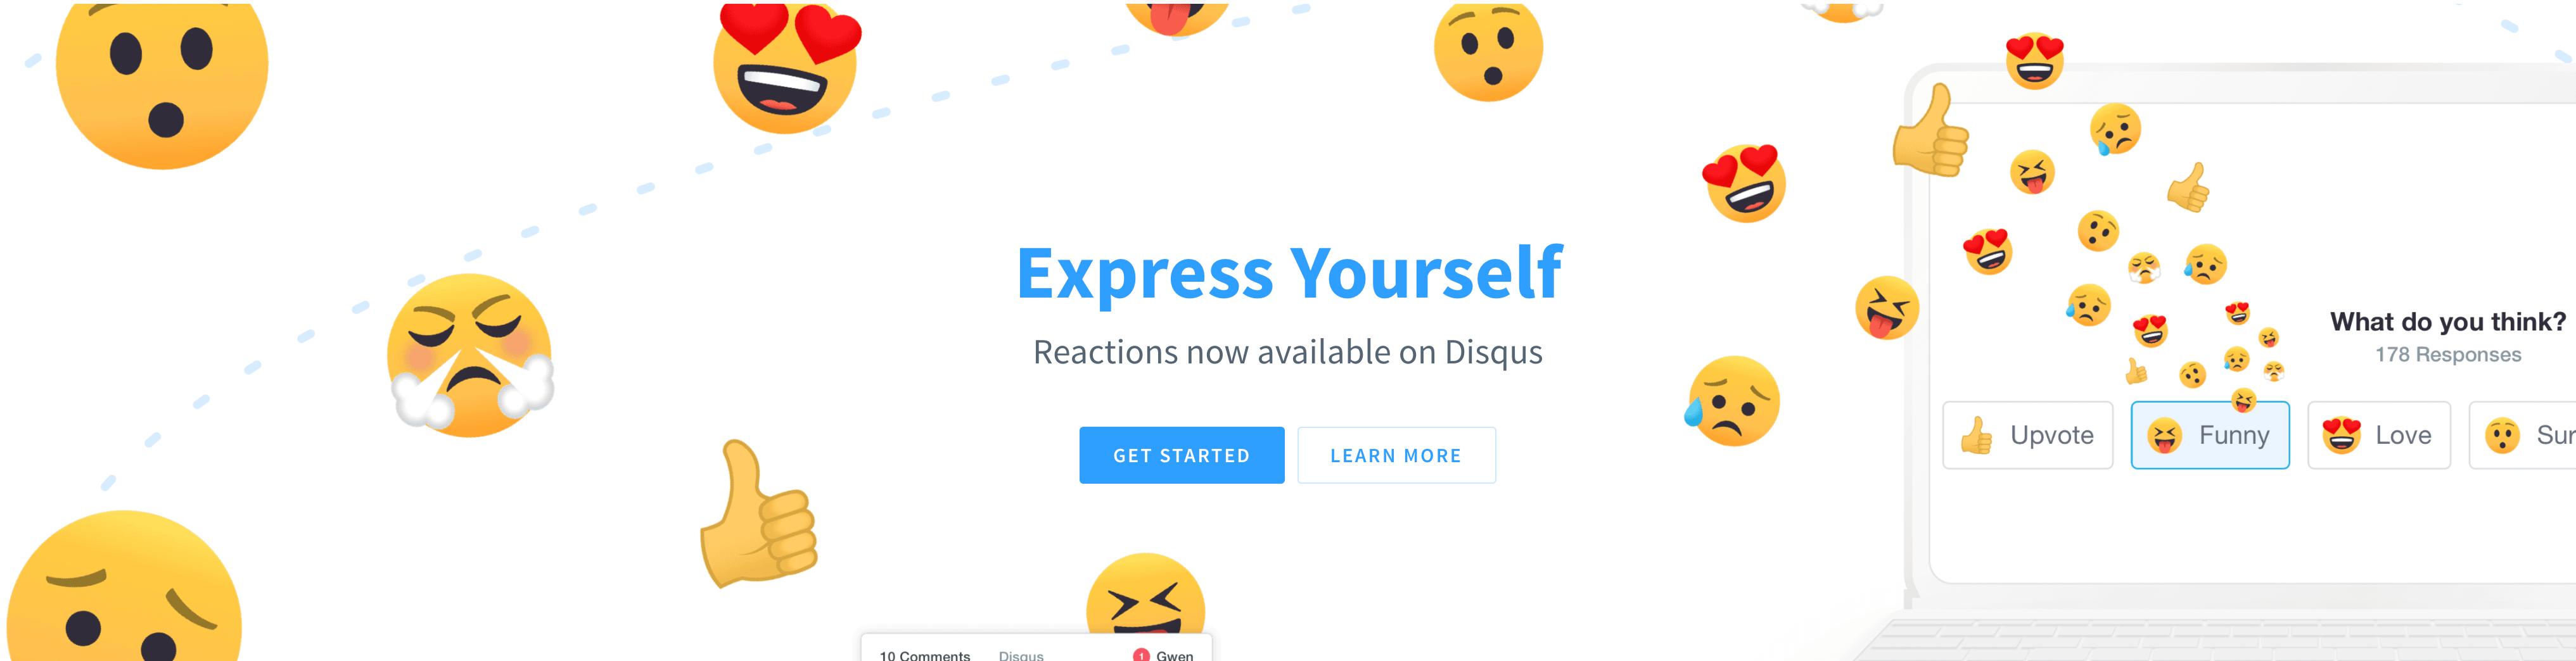 DISQUS公式サイト